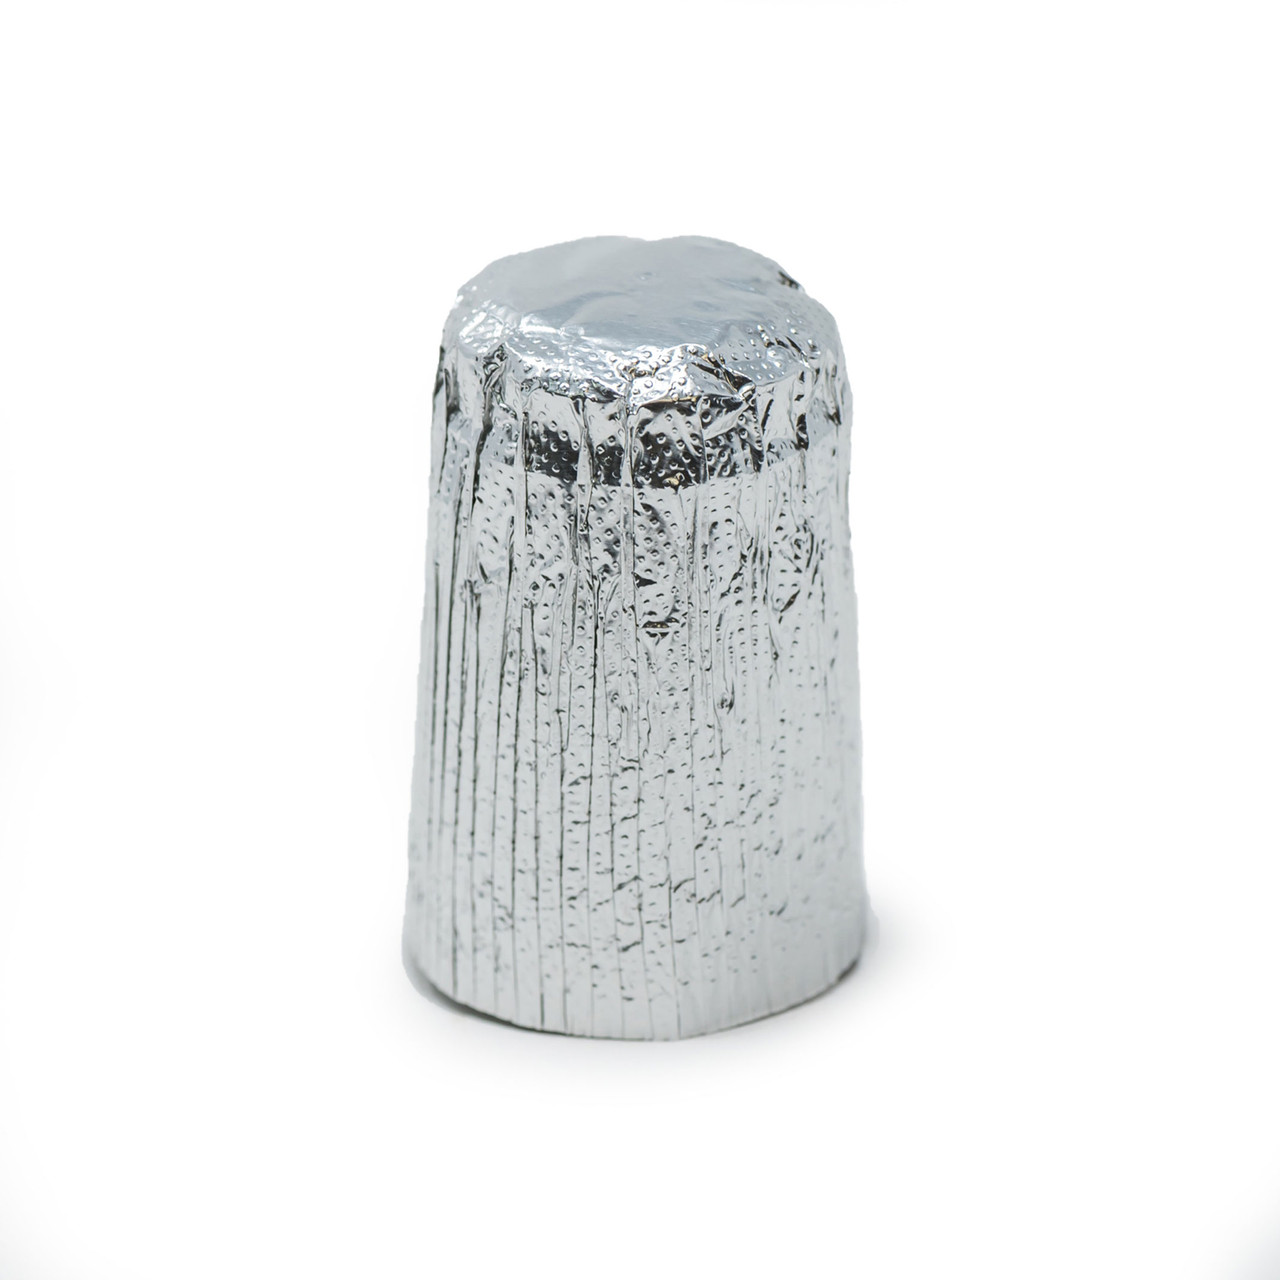 Silver foil top